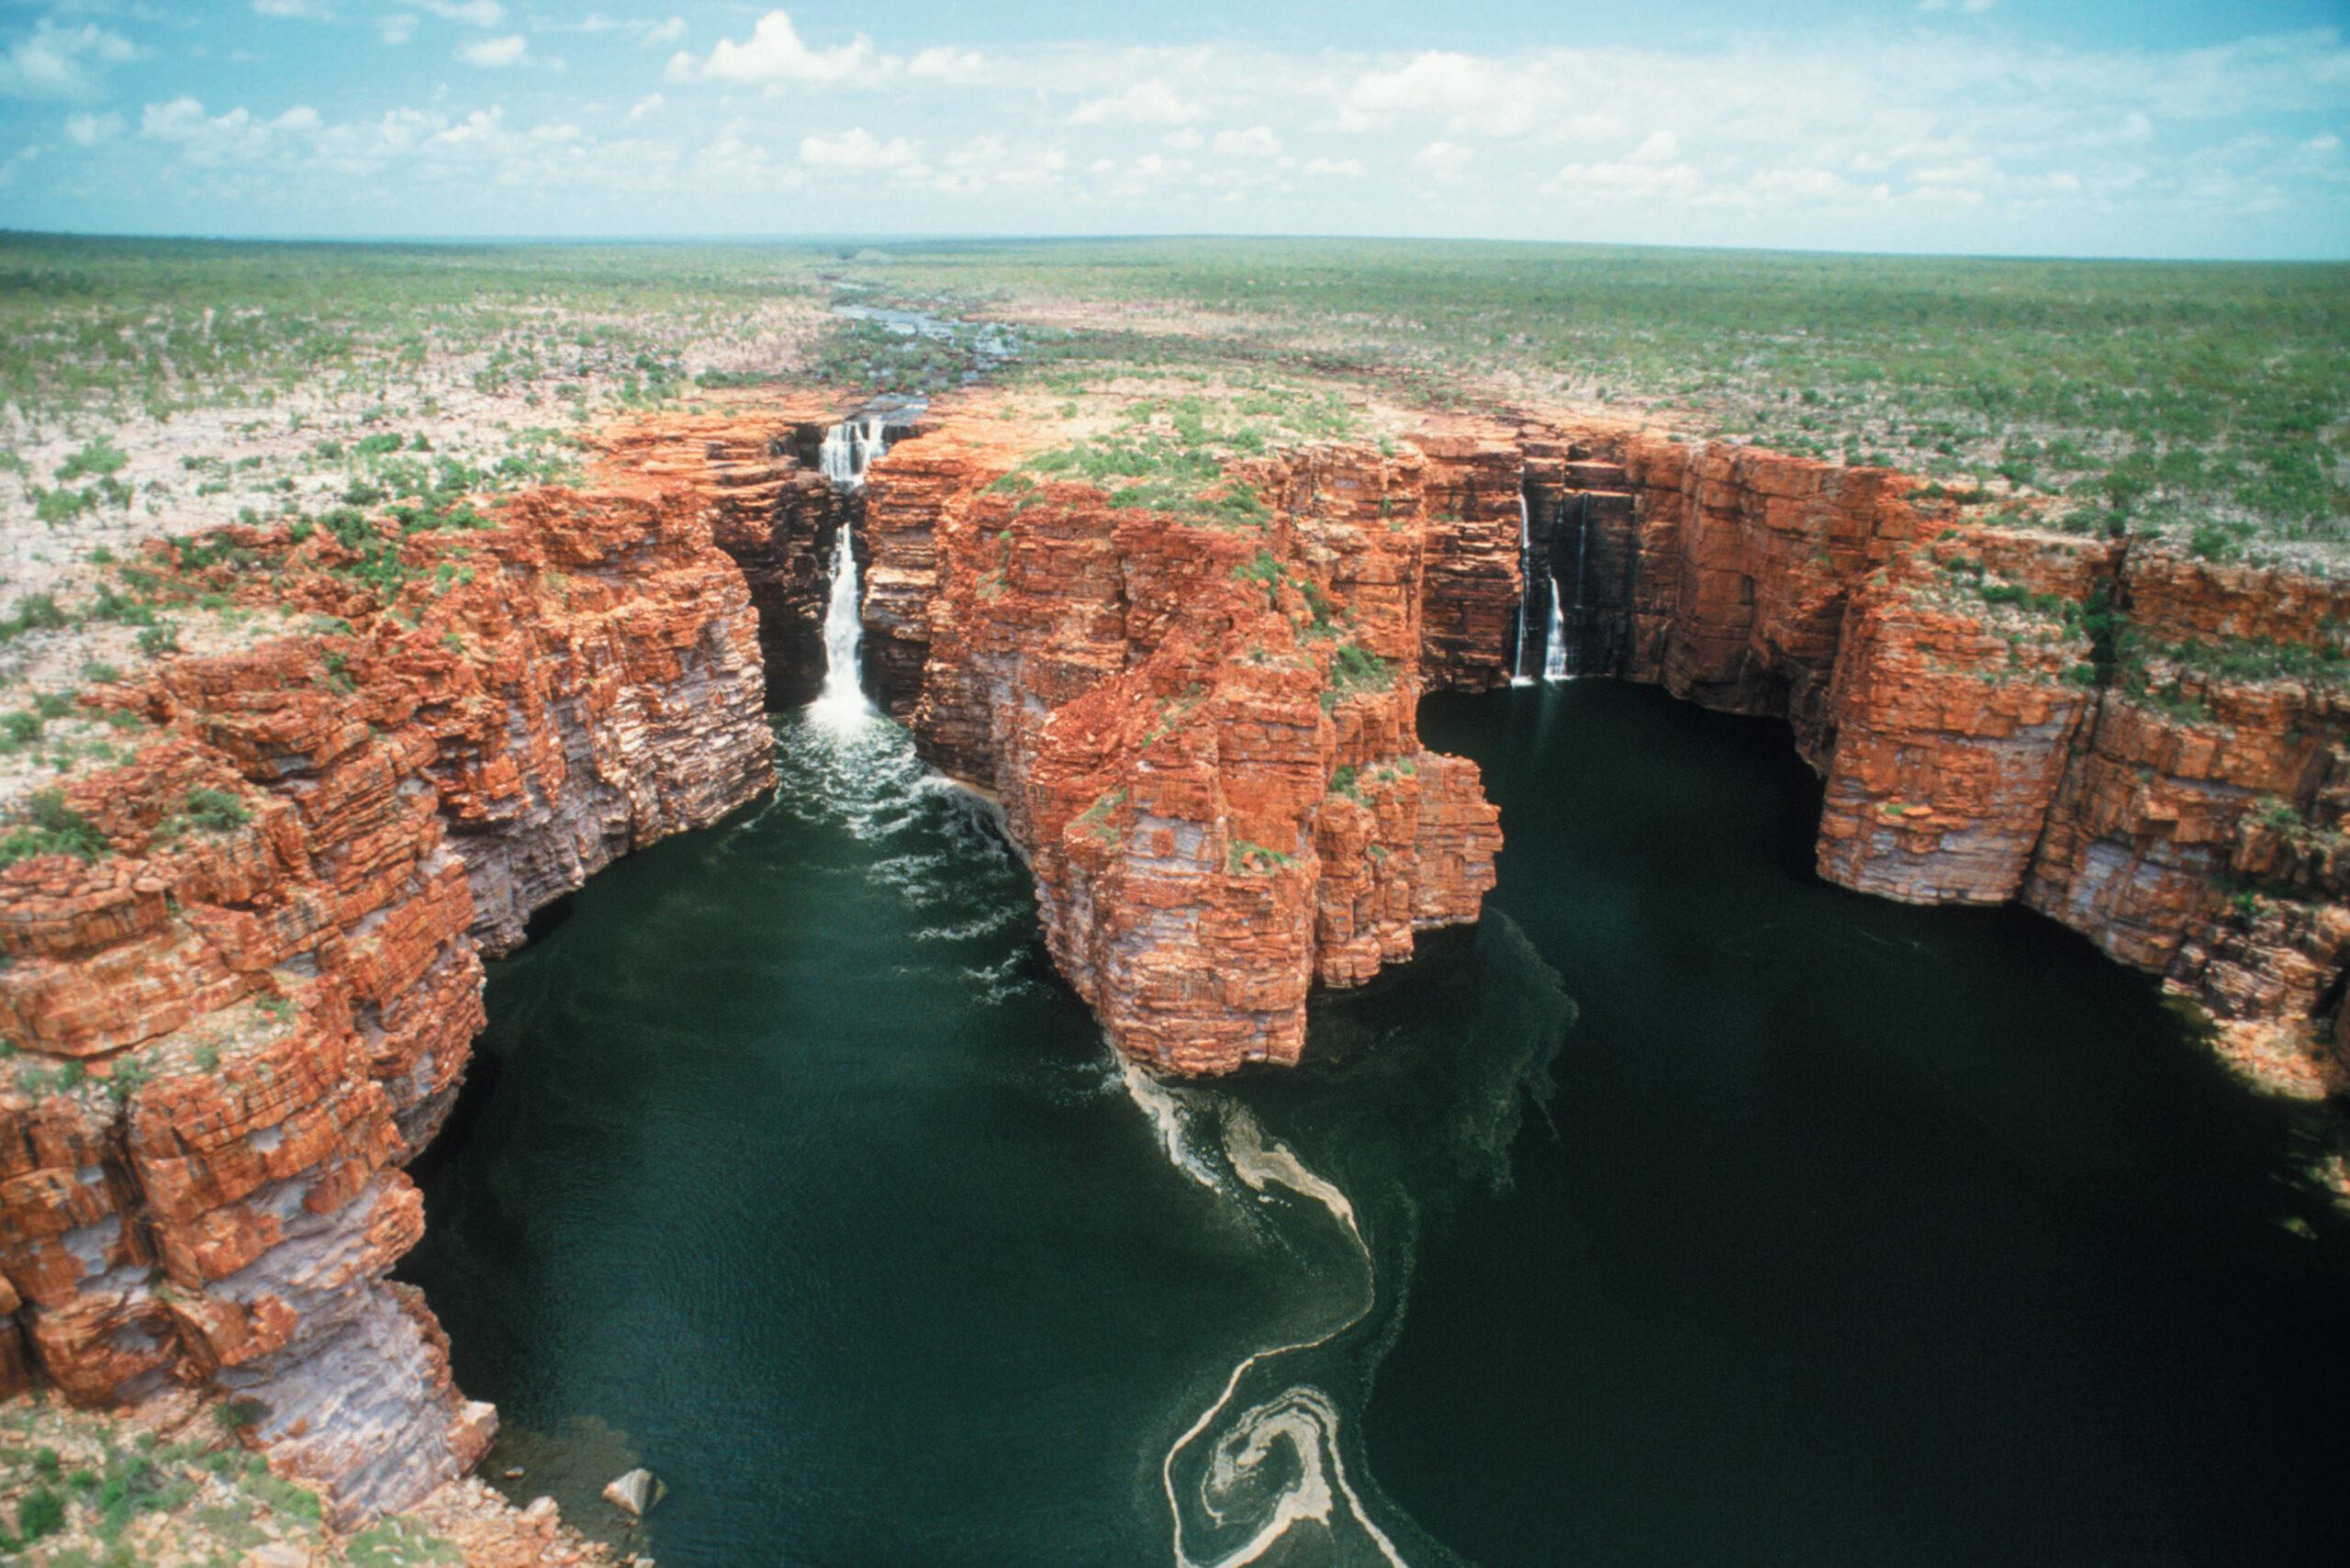 YOTSPACE superyacht voyages - Kimberley voyages - King George Falls